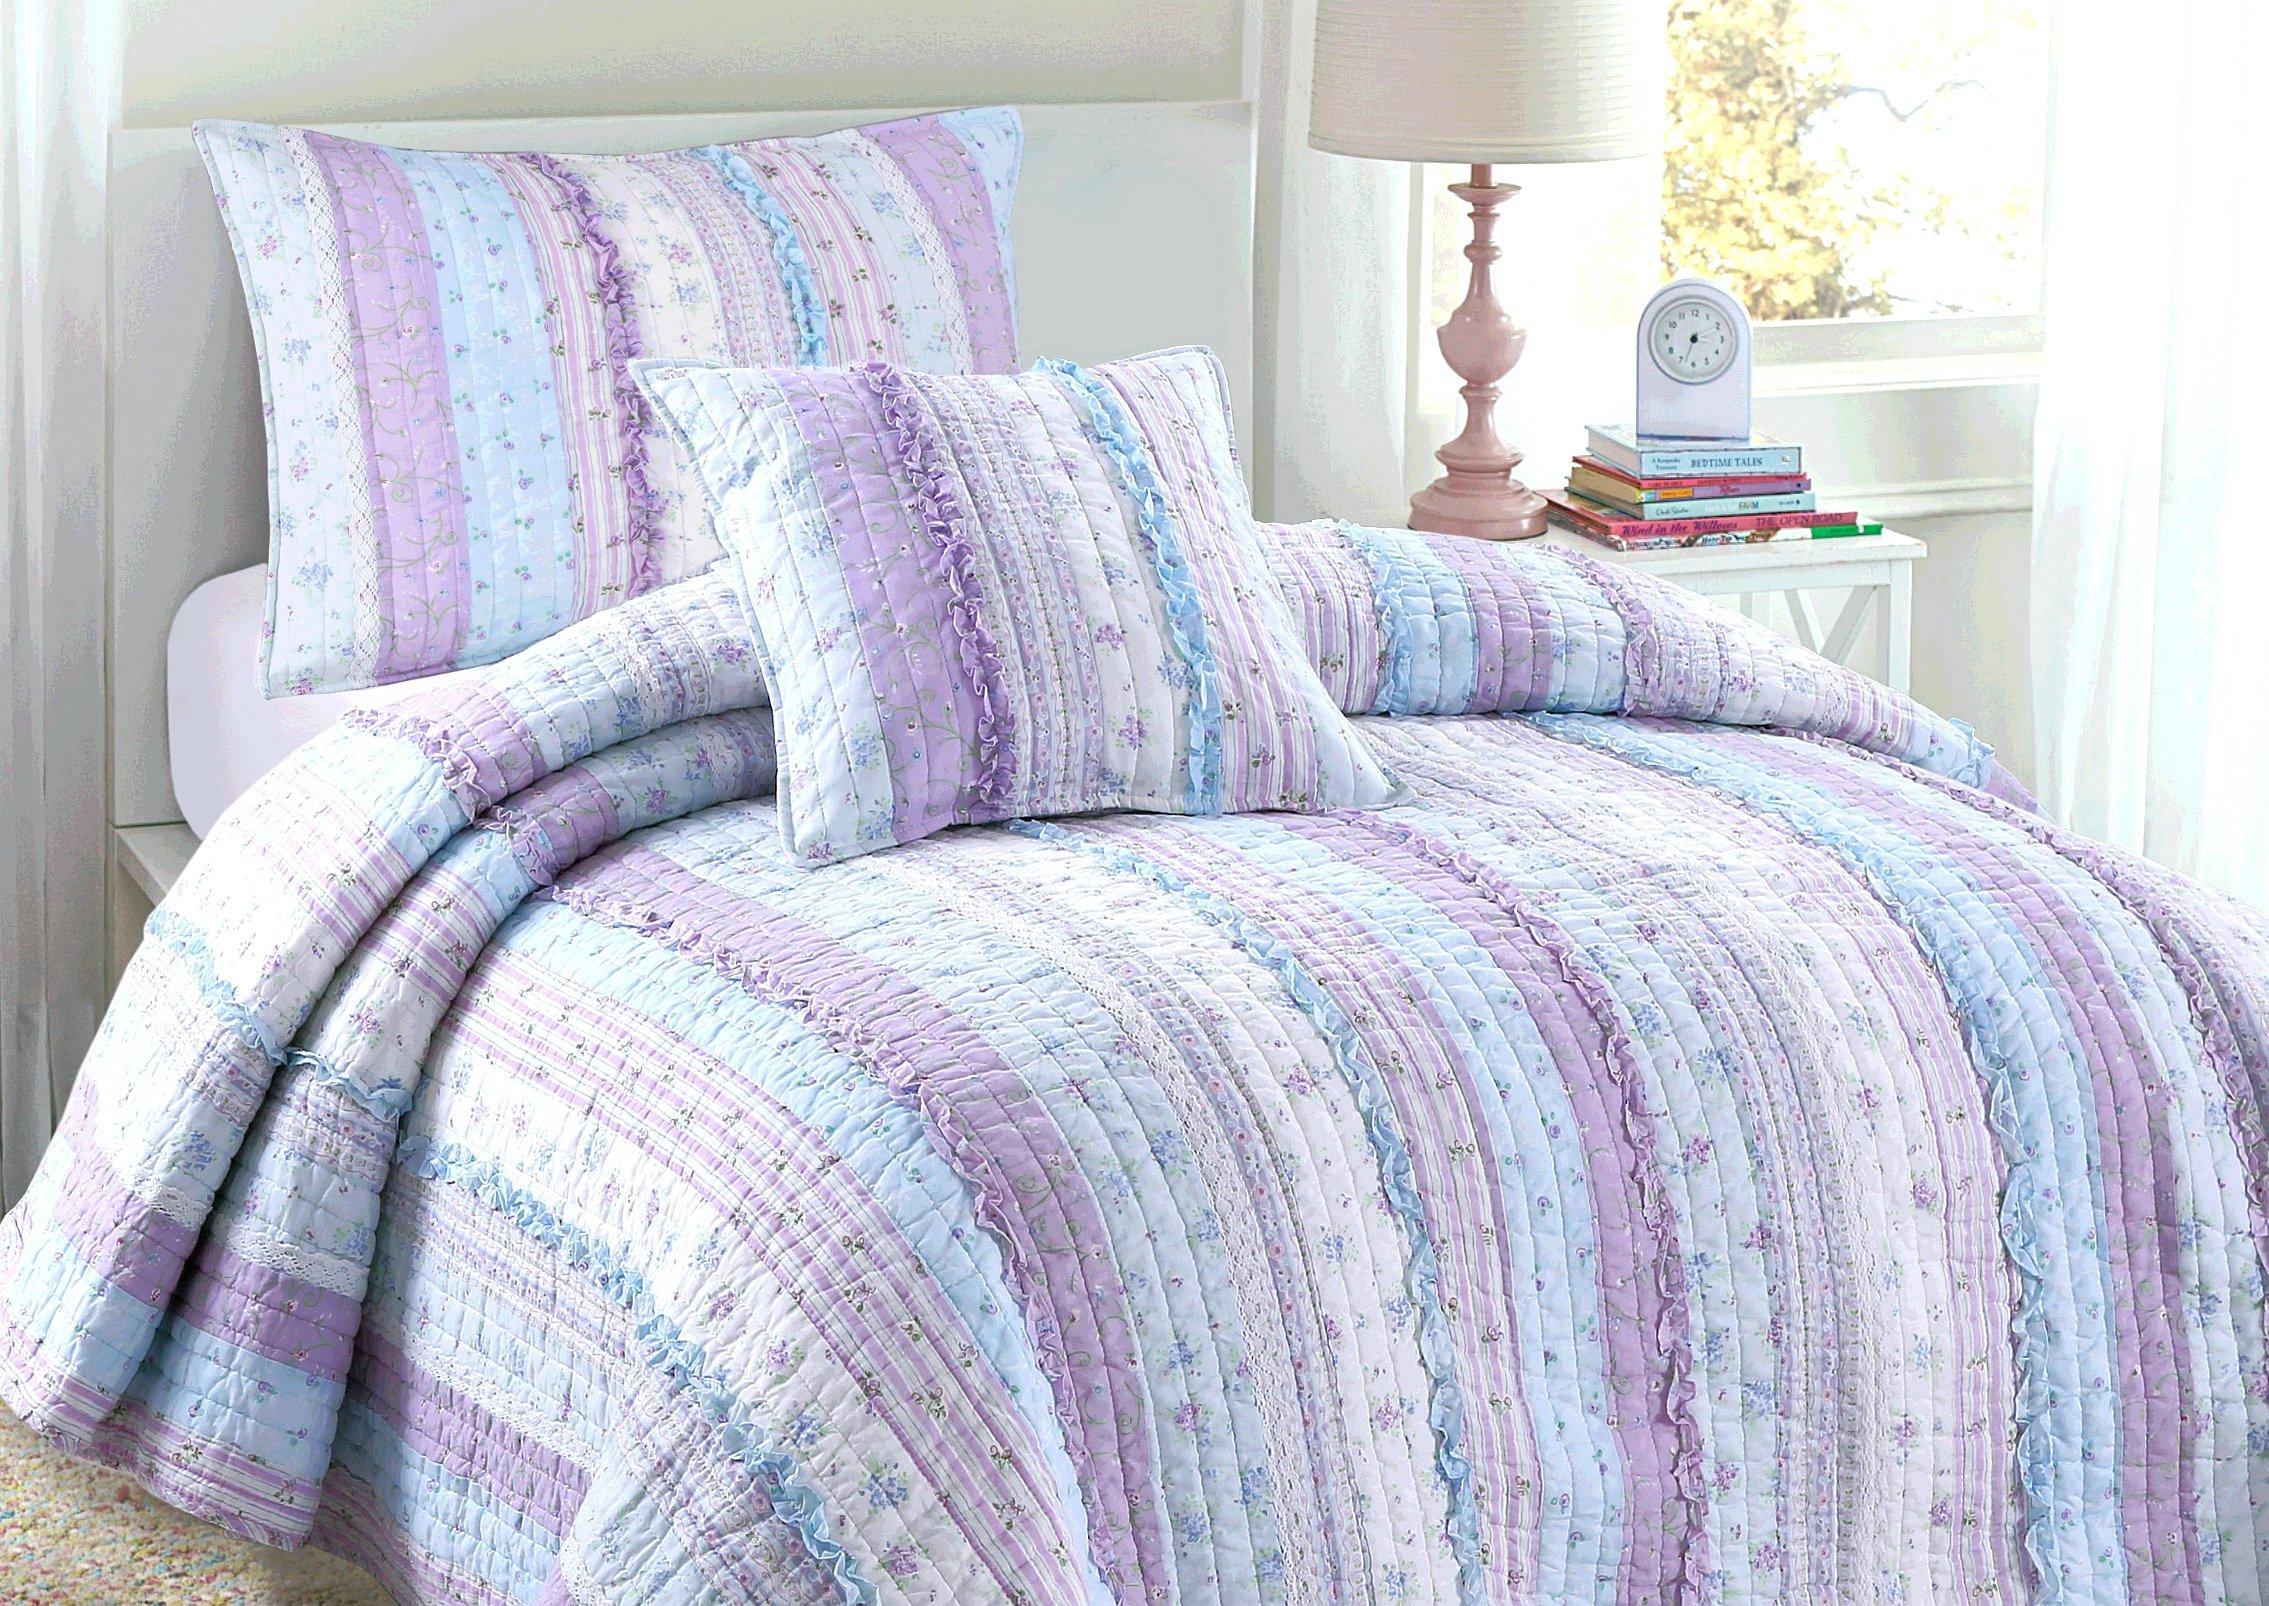 Cozy Line Home Fashions Provence Lavender Chic Lace Orchid Light Purple Blue Flower Print Stripe Cotton 3D Bedding Quilt Set, Reversible Coverlet, Bedspread, Gifts for Girls Women (Queen - 3 piece)